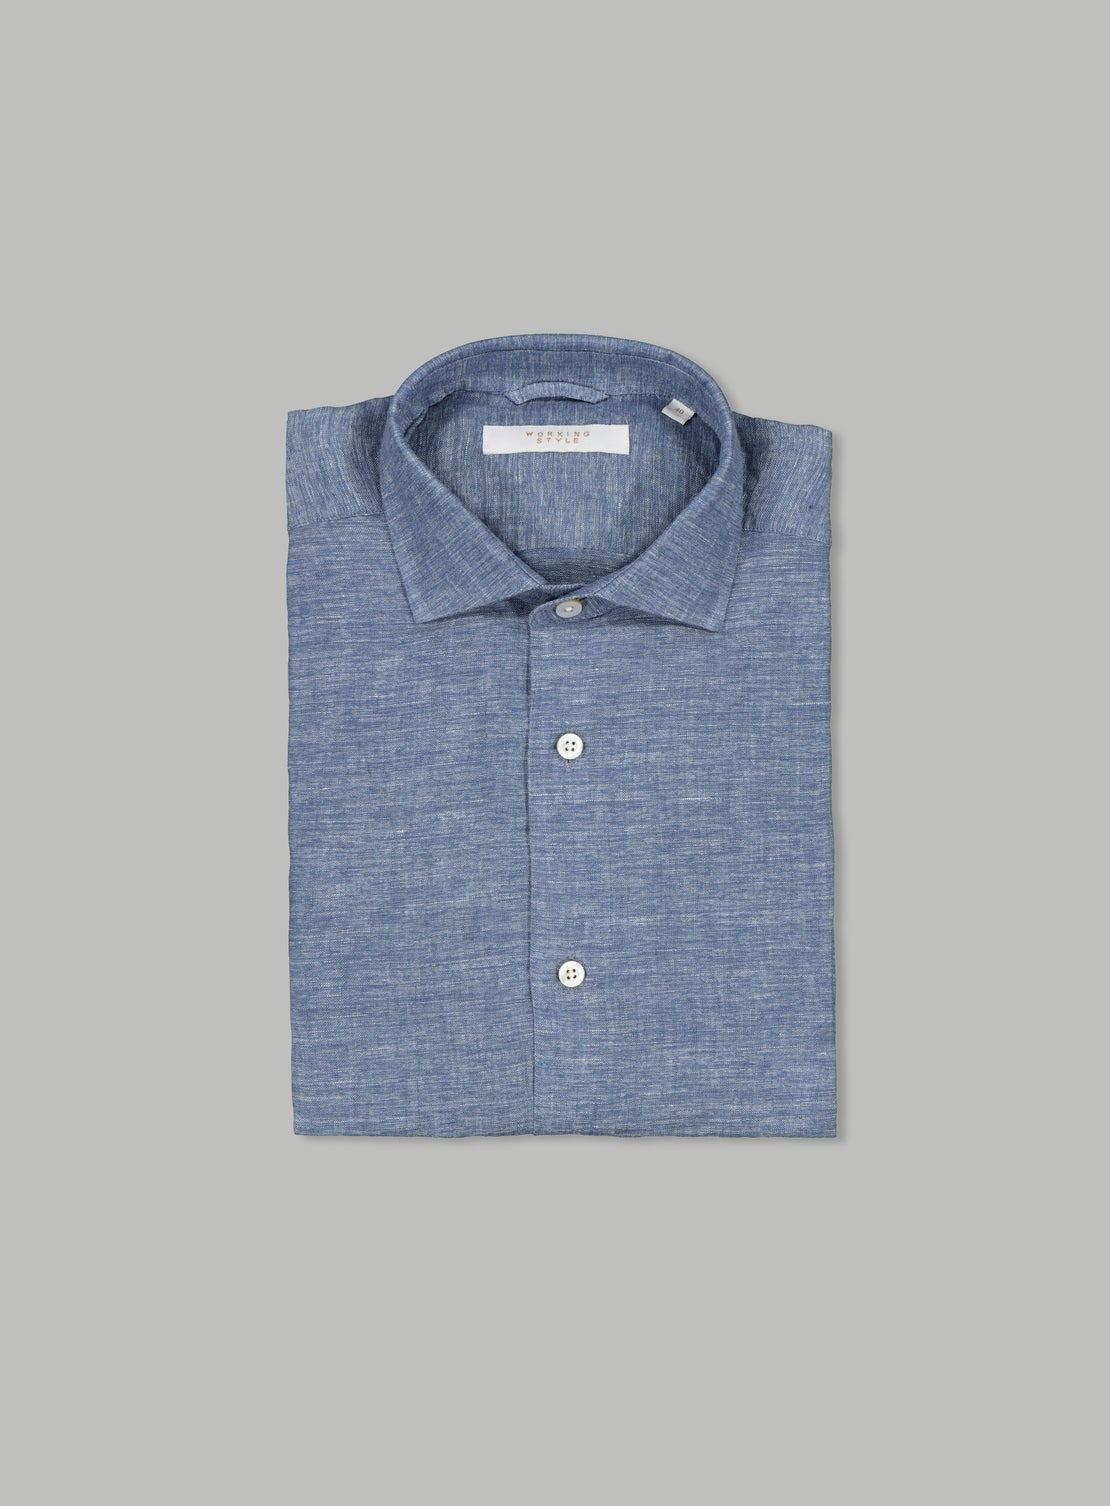 Sam Denim Linen Shirt